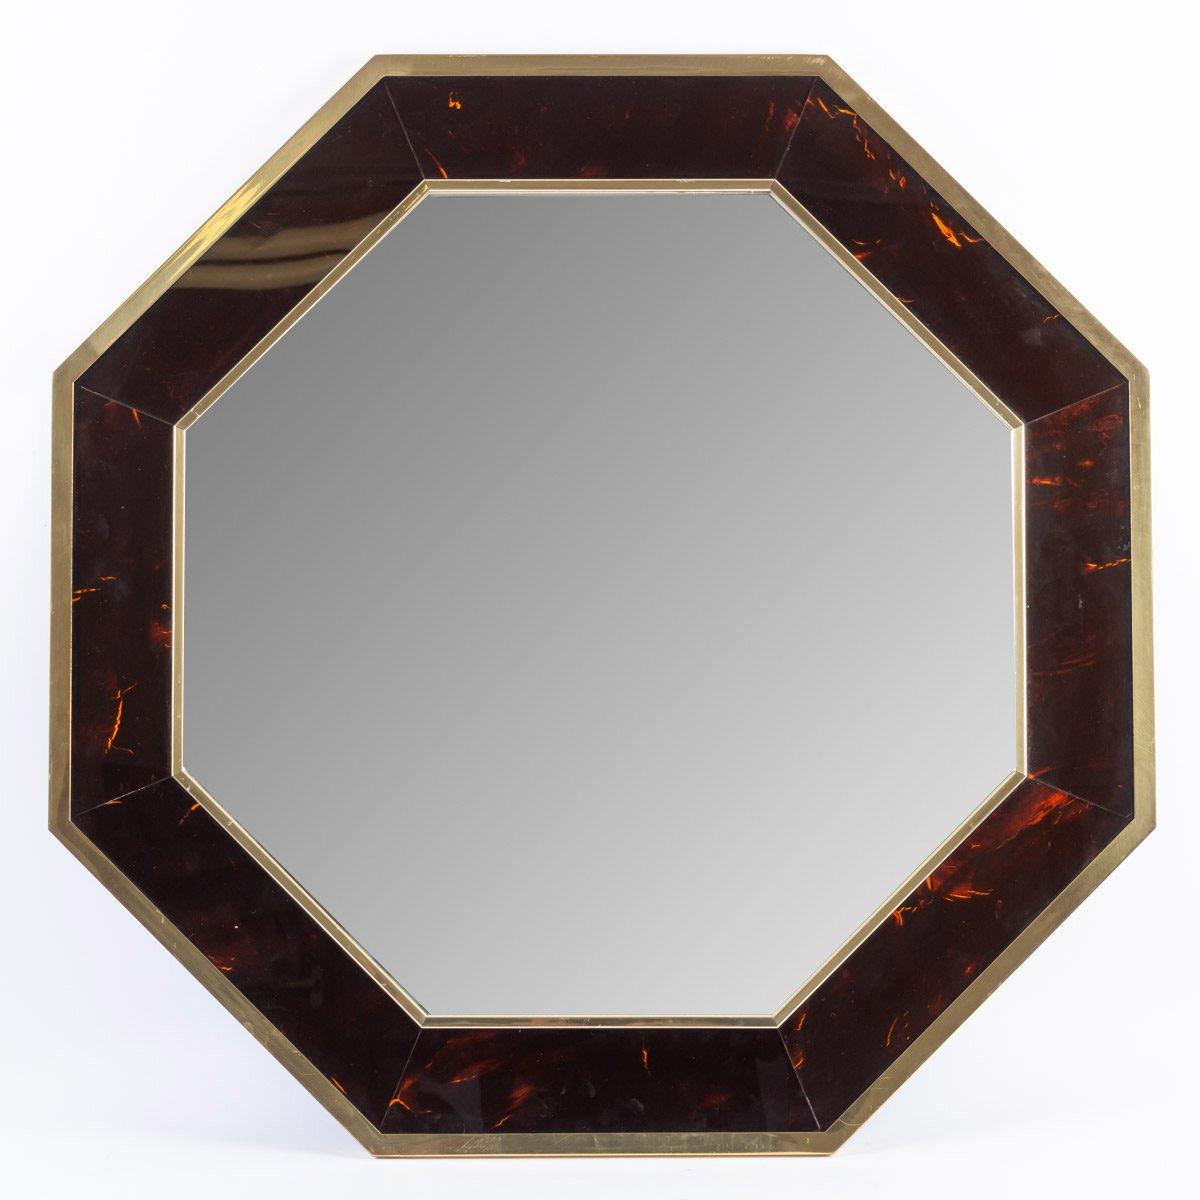 1960s Octagonal Mirror